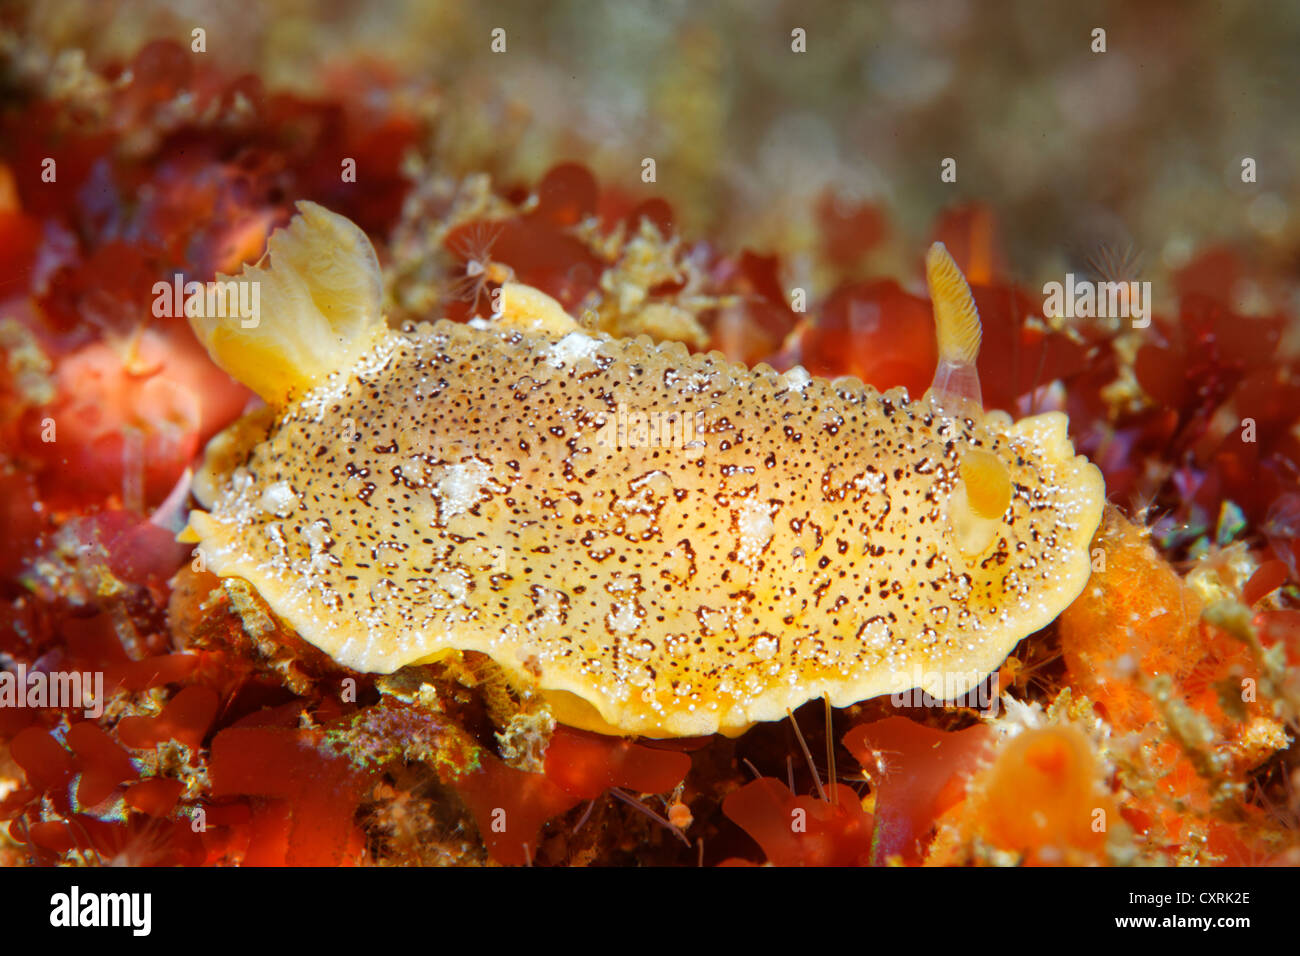 Unidentified nudibranch (Nudibranchia) Ponta de Sao Vicente, Isabella Isola, Albemarle, Isole Galapagos, un patrimonio Foto Stock